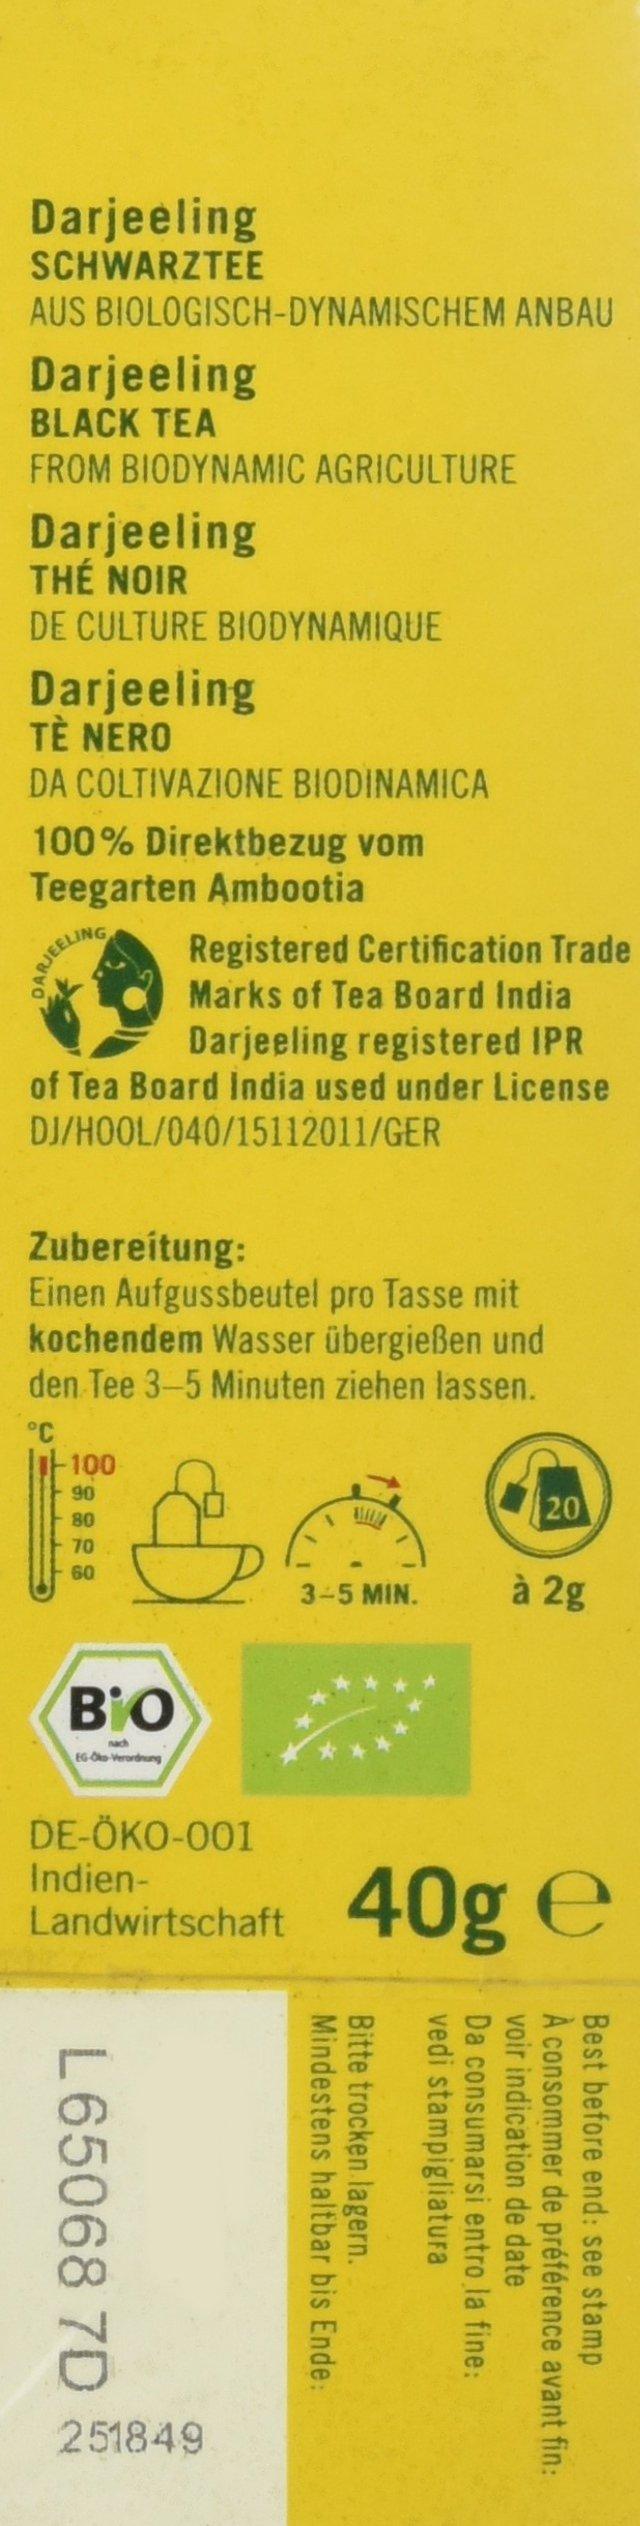 Lebensbaum-Darjeeling-Schwarztee-demeter-4er-Pack-4-x-40-g